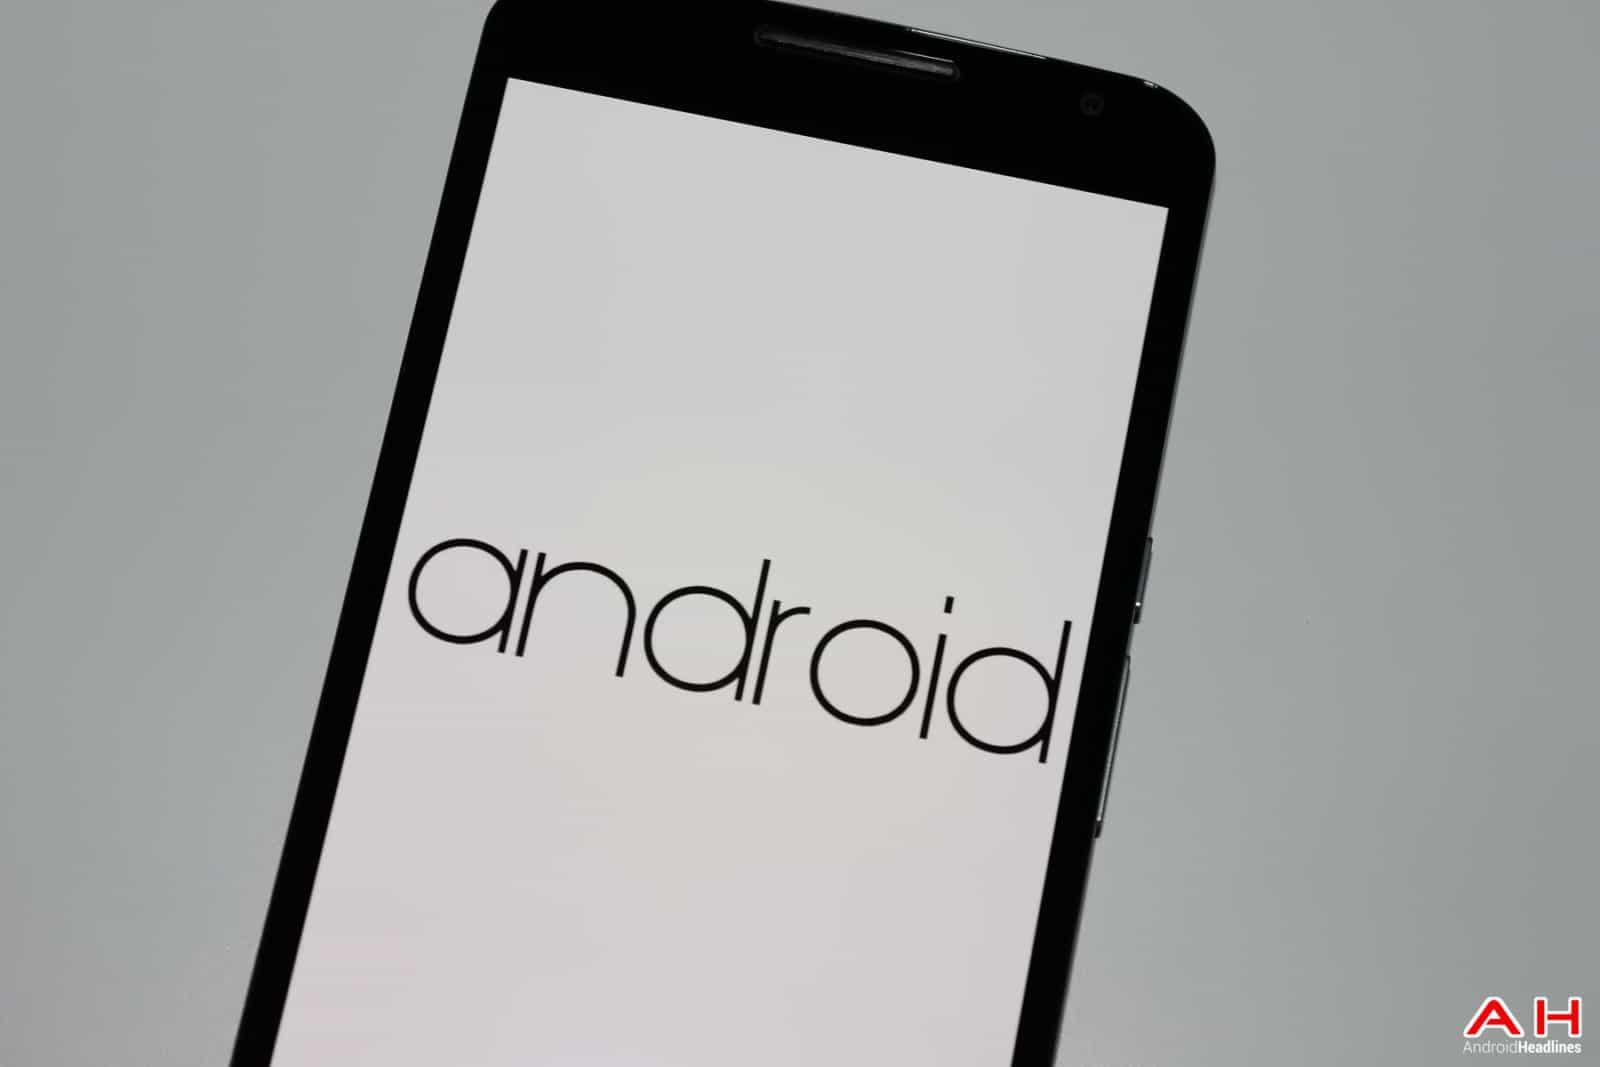 AH 2015 Android LOGO-225